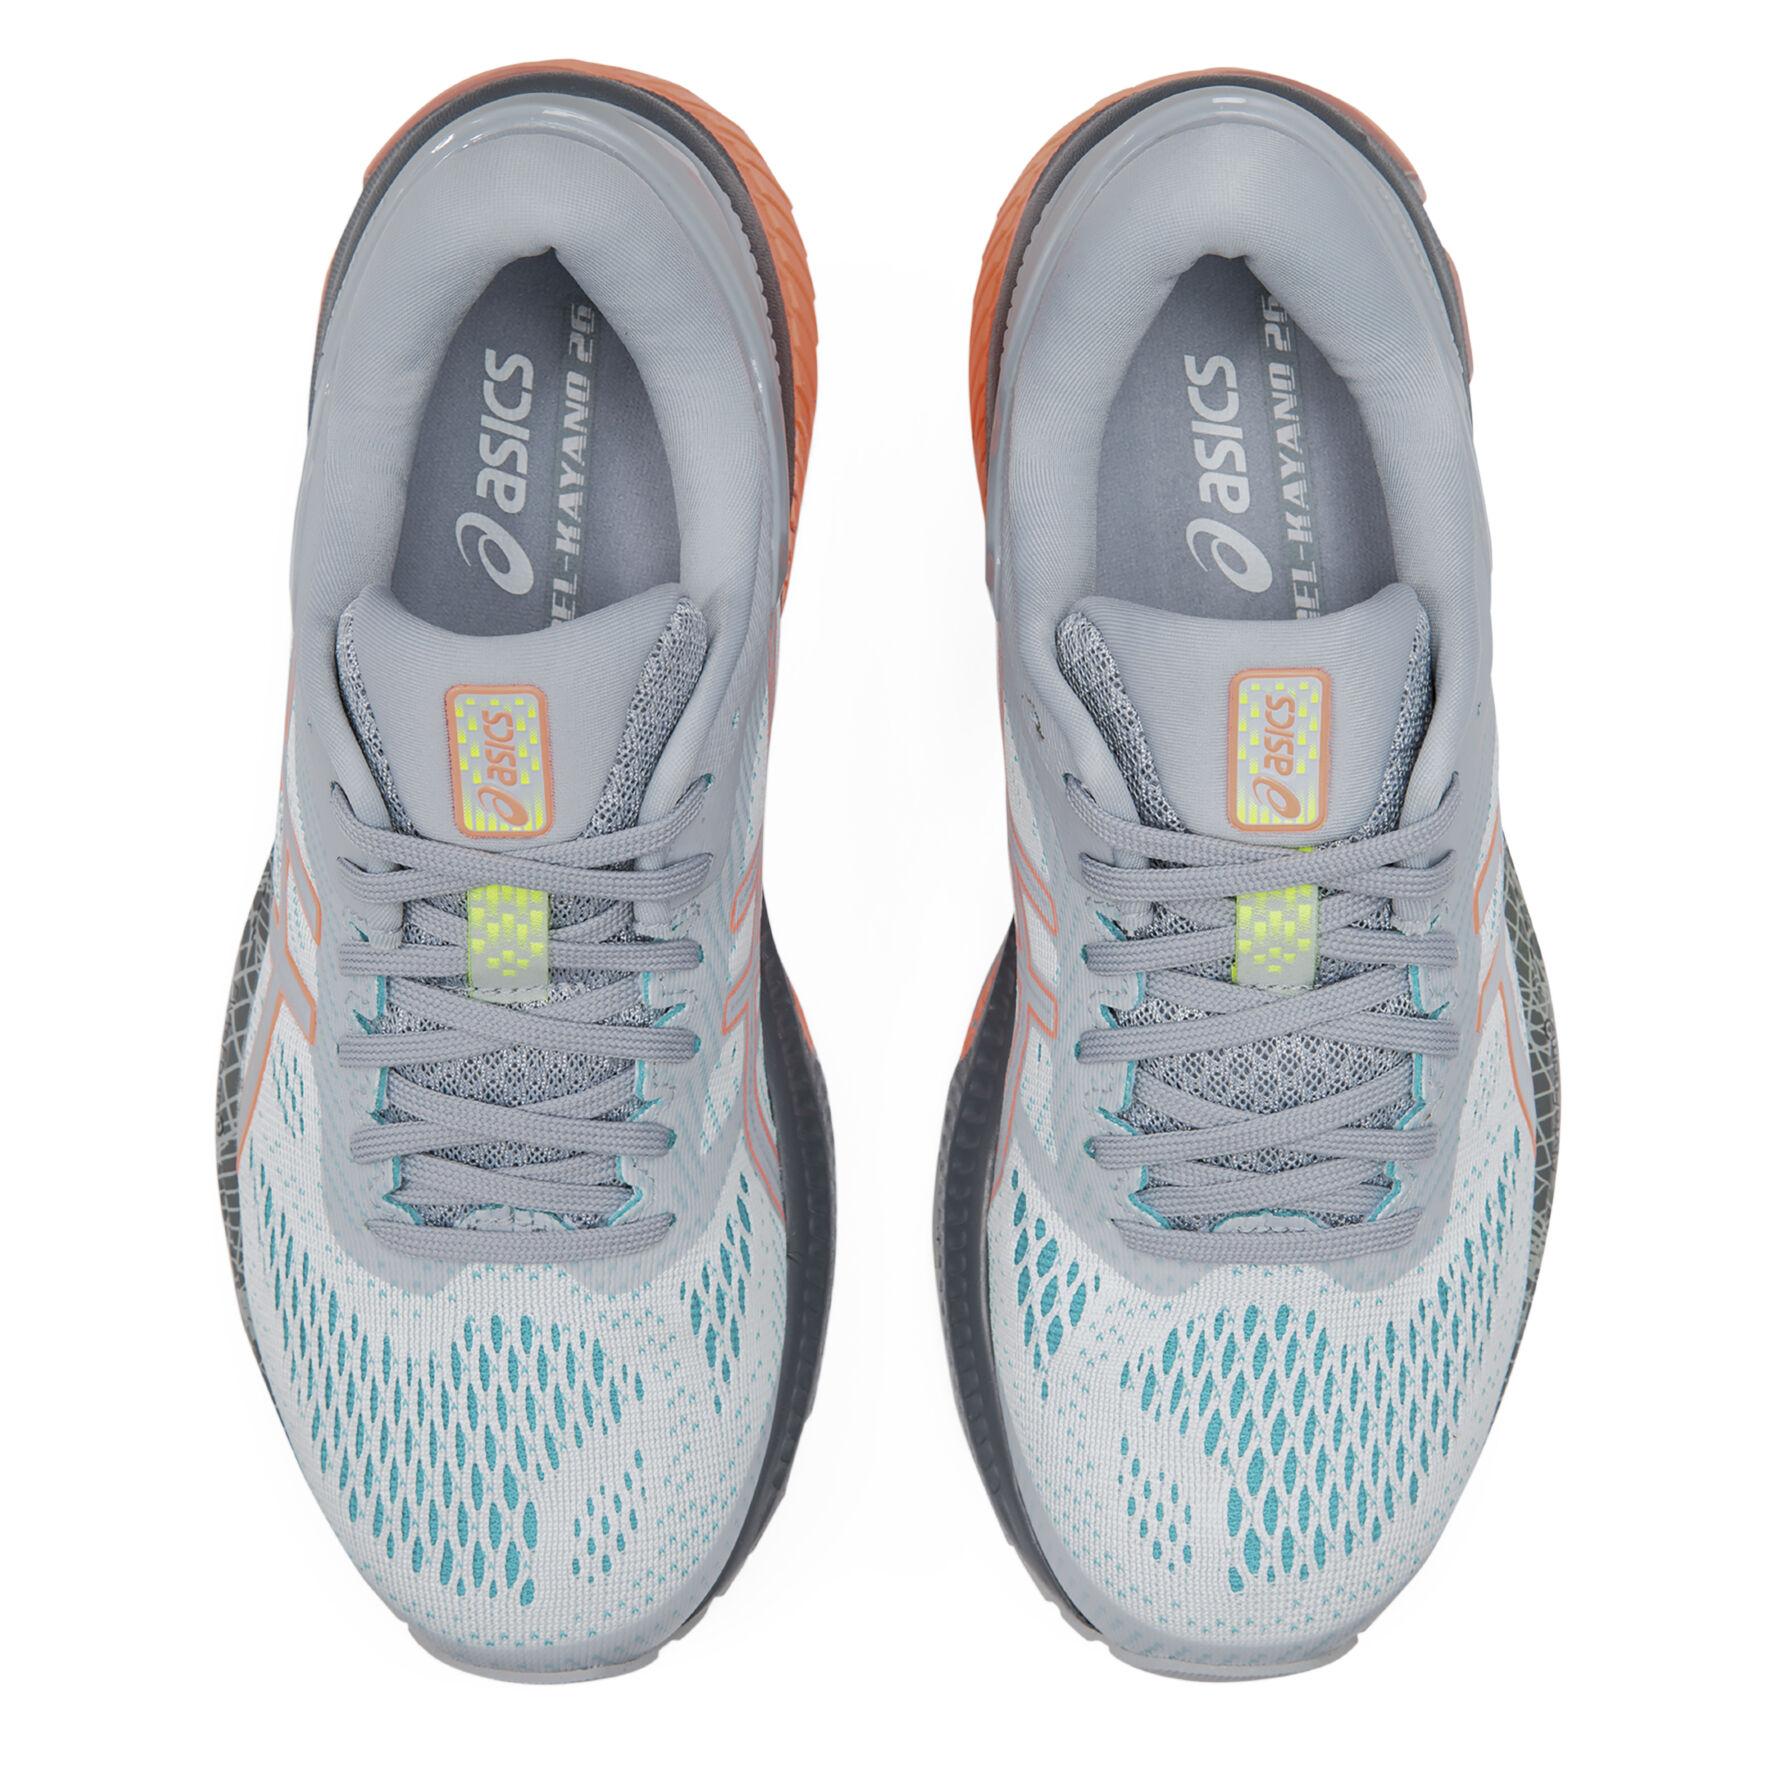 buy Asics Gel-Kayano 26 Lite-Show Stability Running Shoe ...